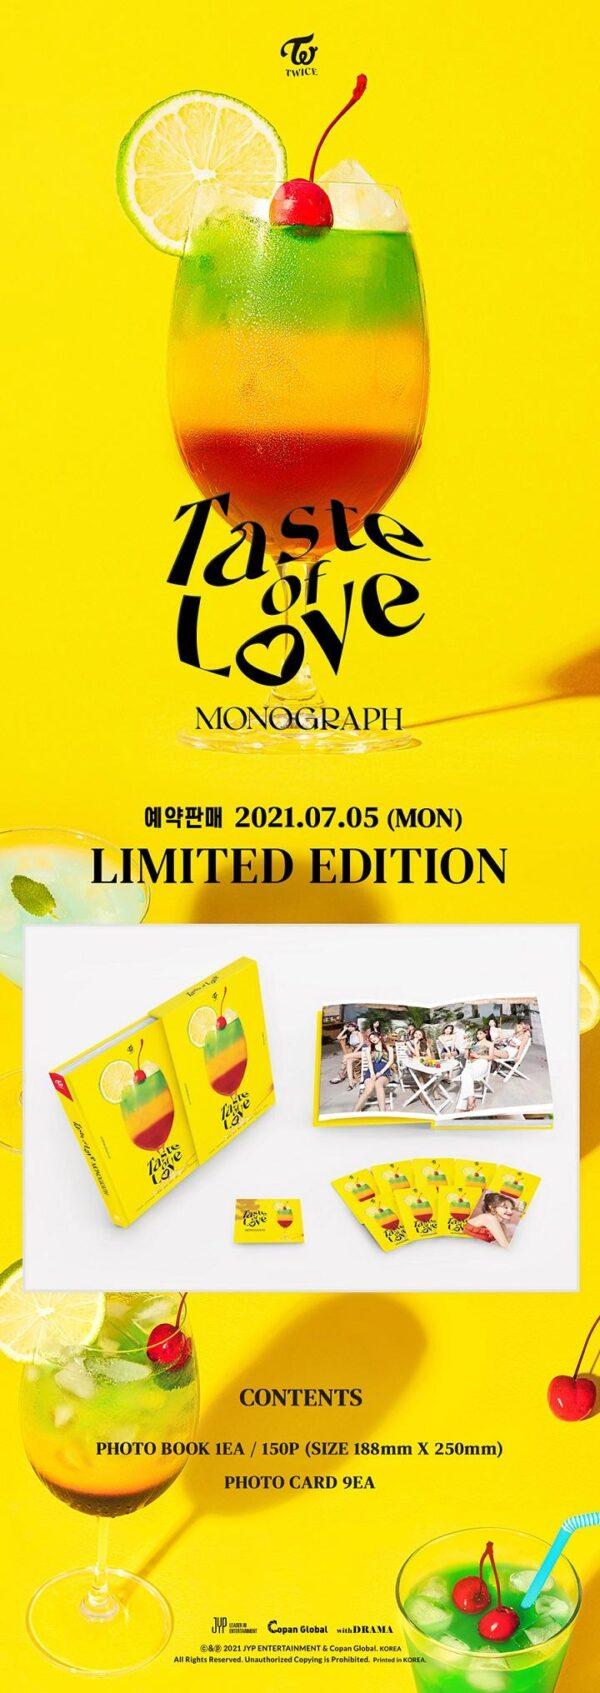 PhotoBook de TWICE MONOGRAPH TASTE OF LOVE 1